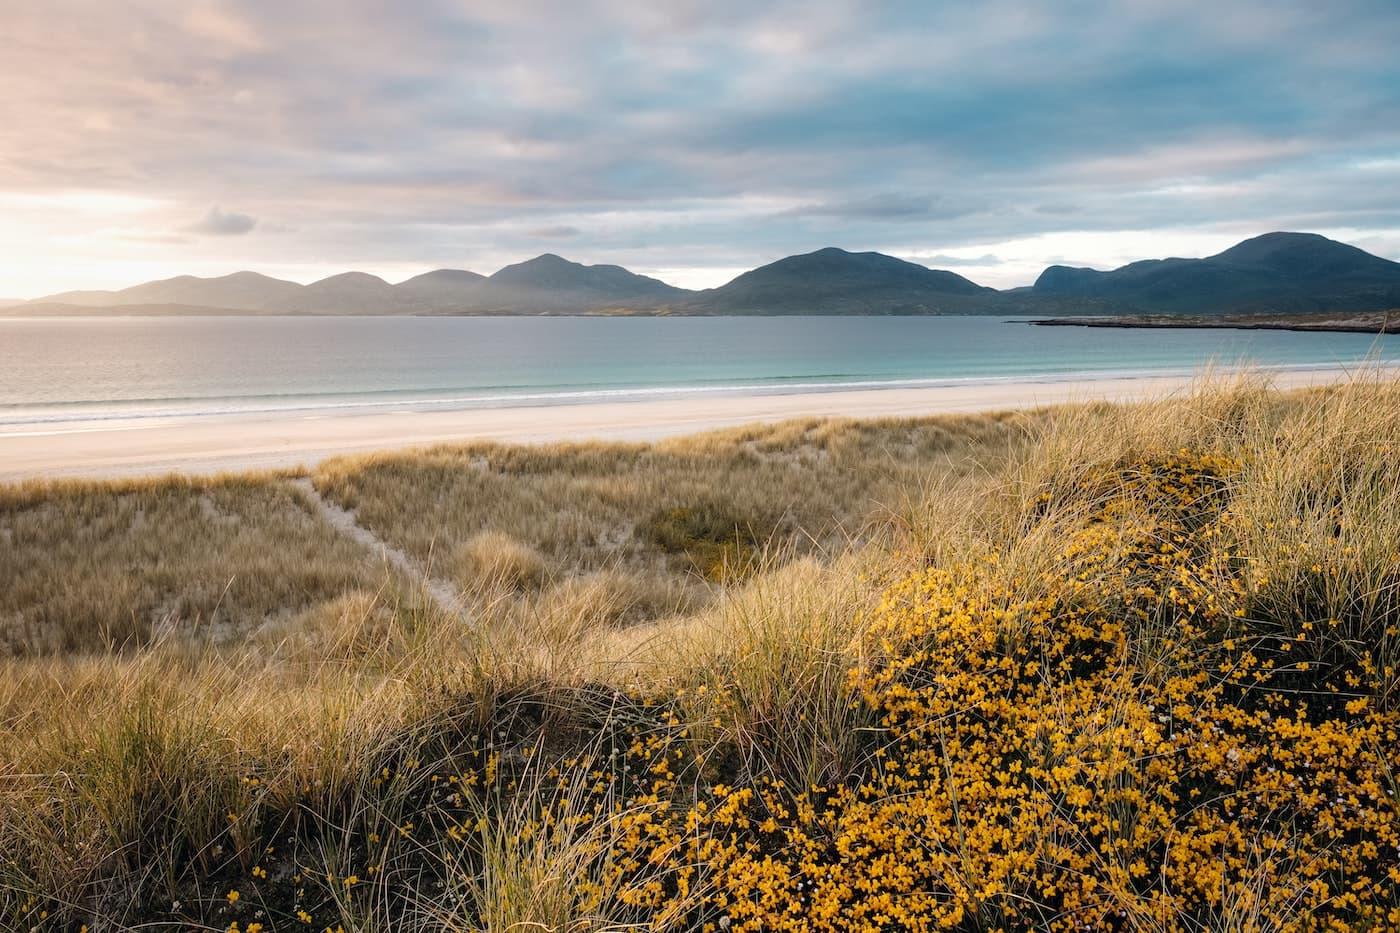 Luskentyre beach credit Nils Leonhardt via Unsplash